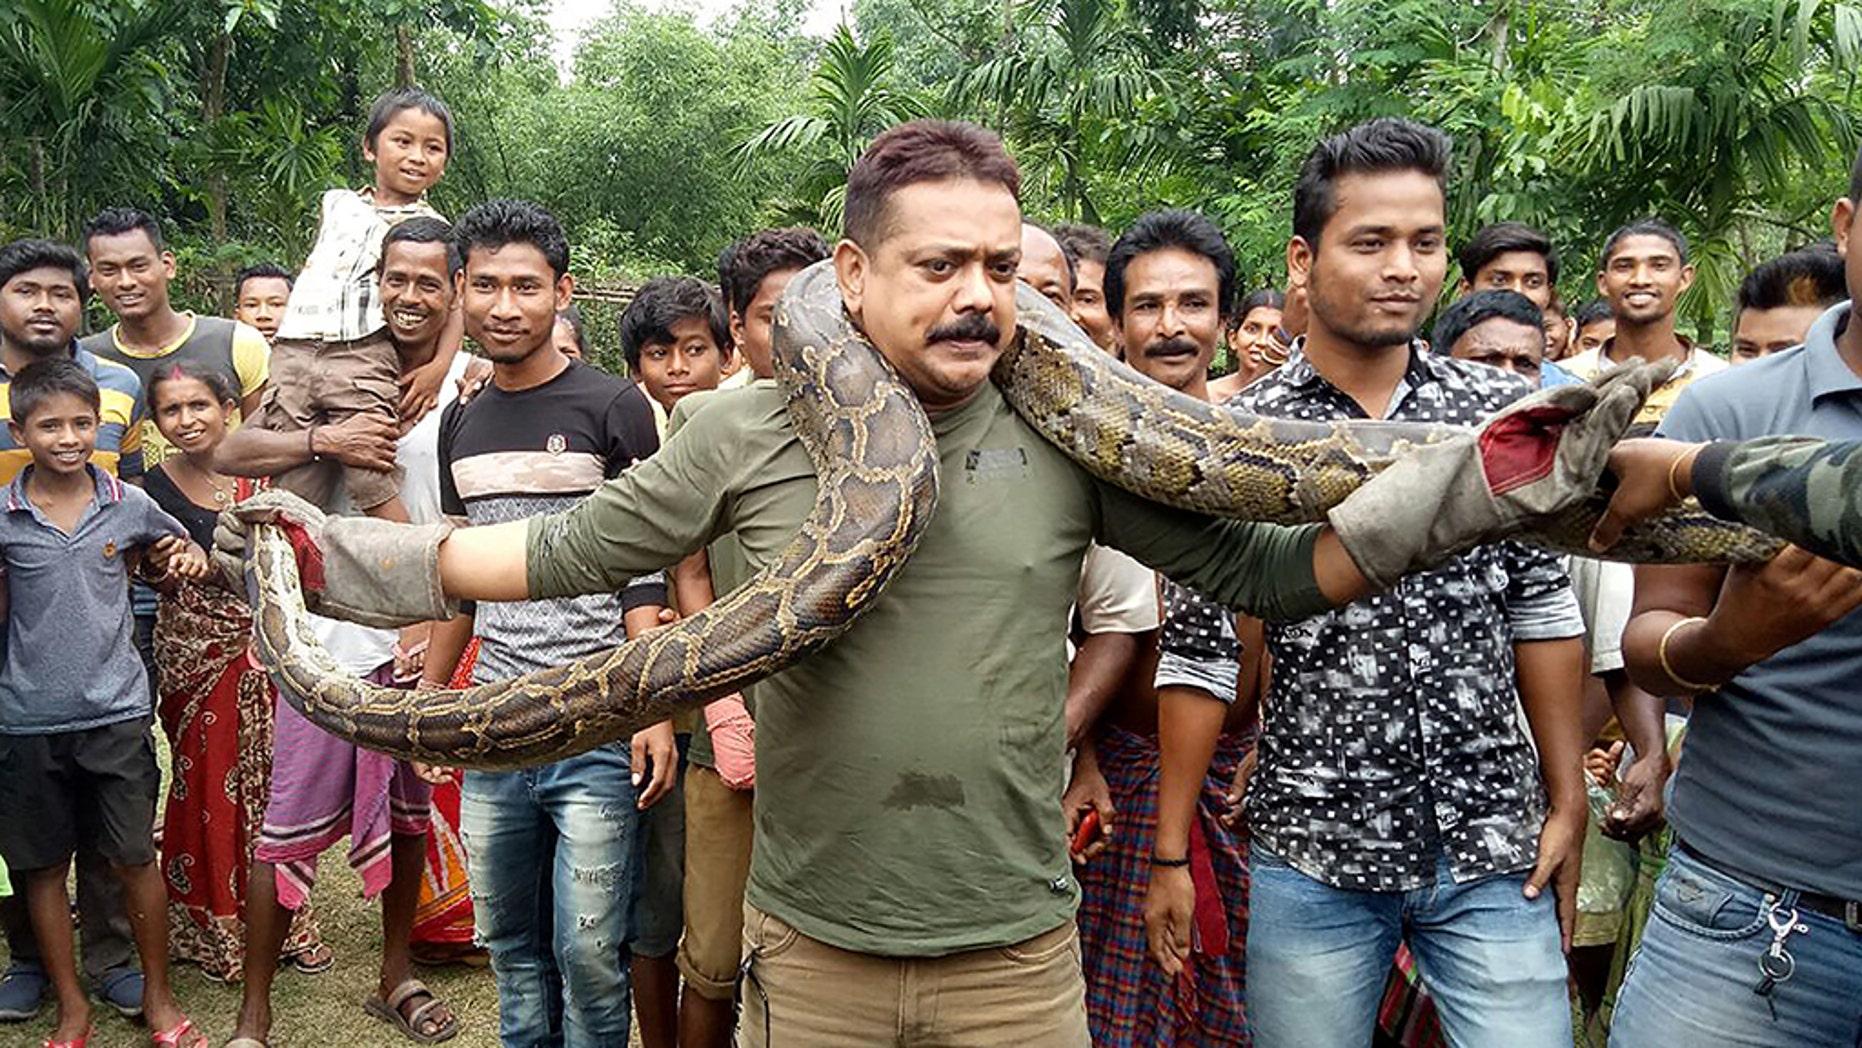 Forest ranger officer Sanjay Dutta (C), holds a 30 feet long python weighing 90lbs at Sahebbari village in Jalpaiguri district